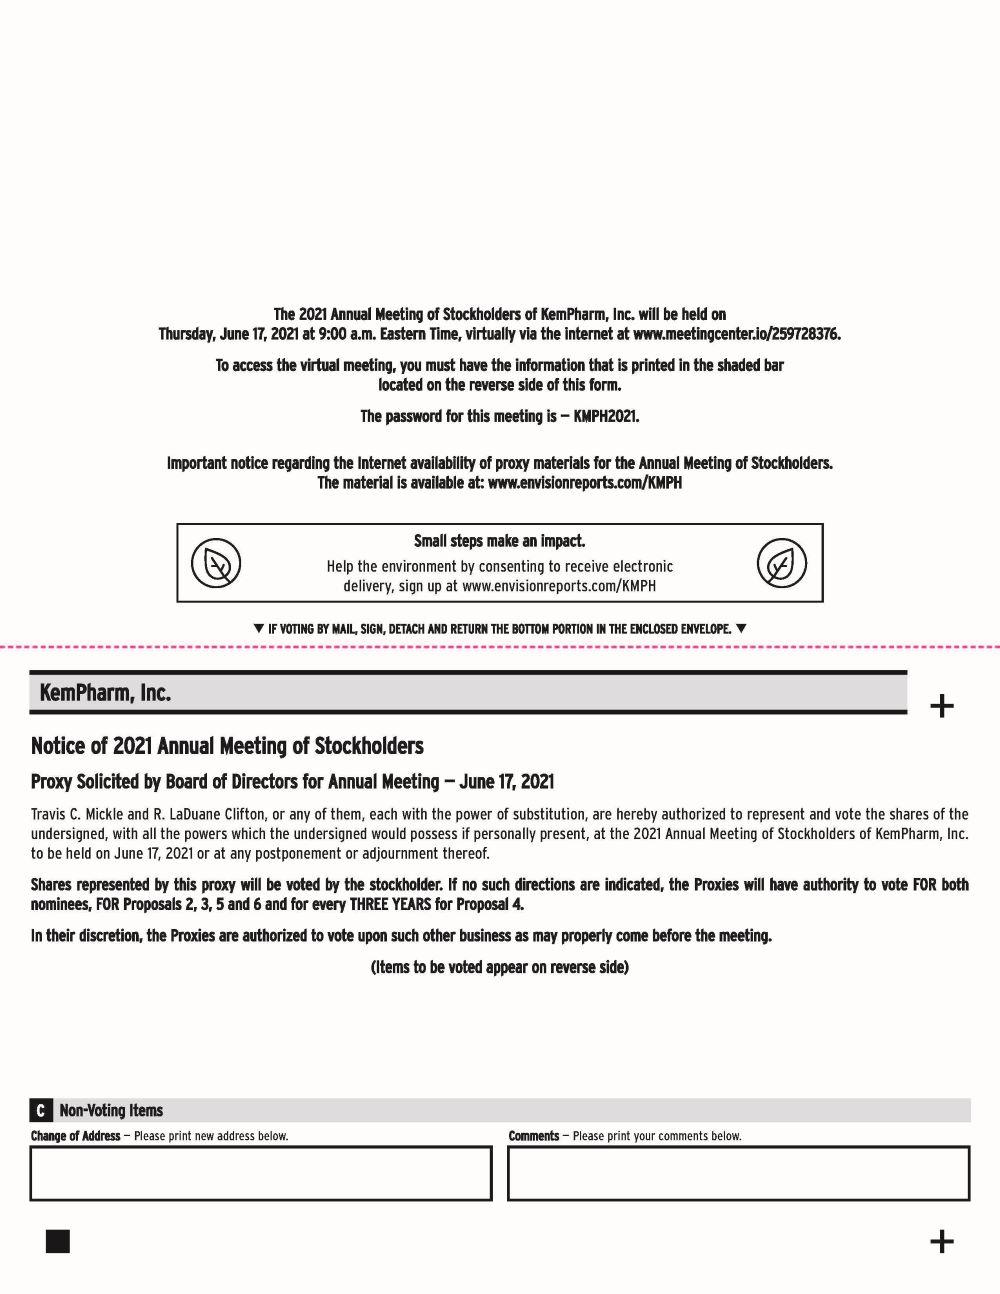 https://cdn.kscope.io/eb653a7d82d872eaf5e62a042769bb52-proxycardpage2.jpg